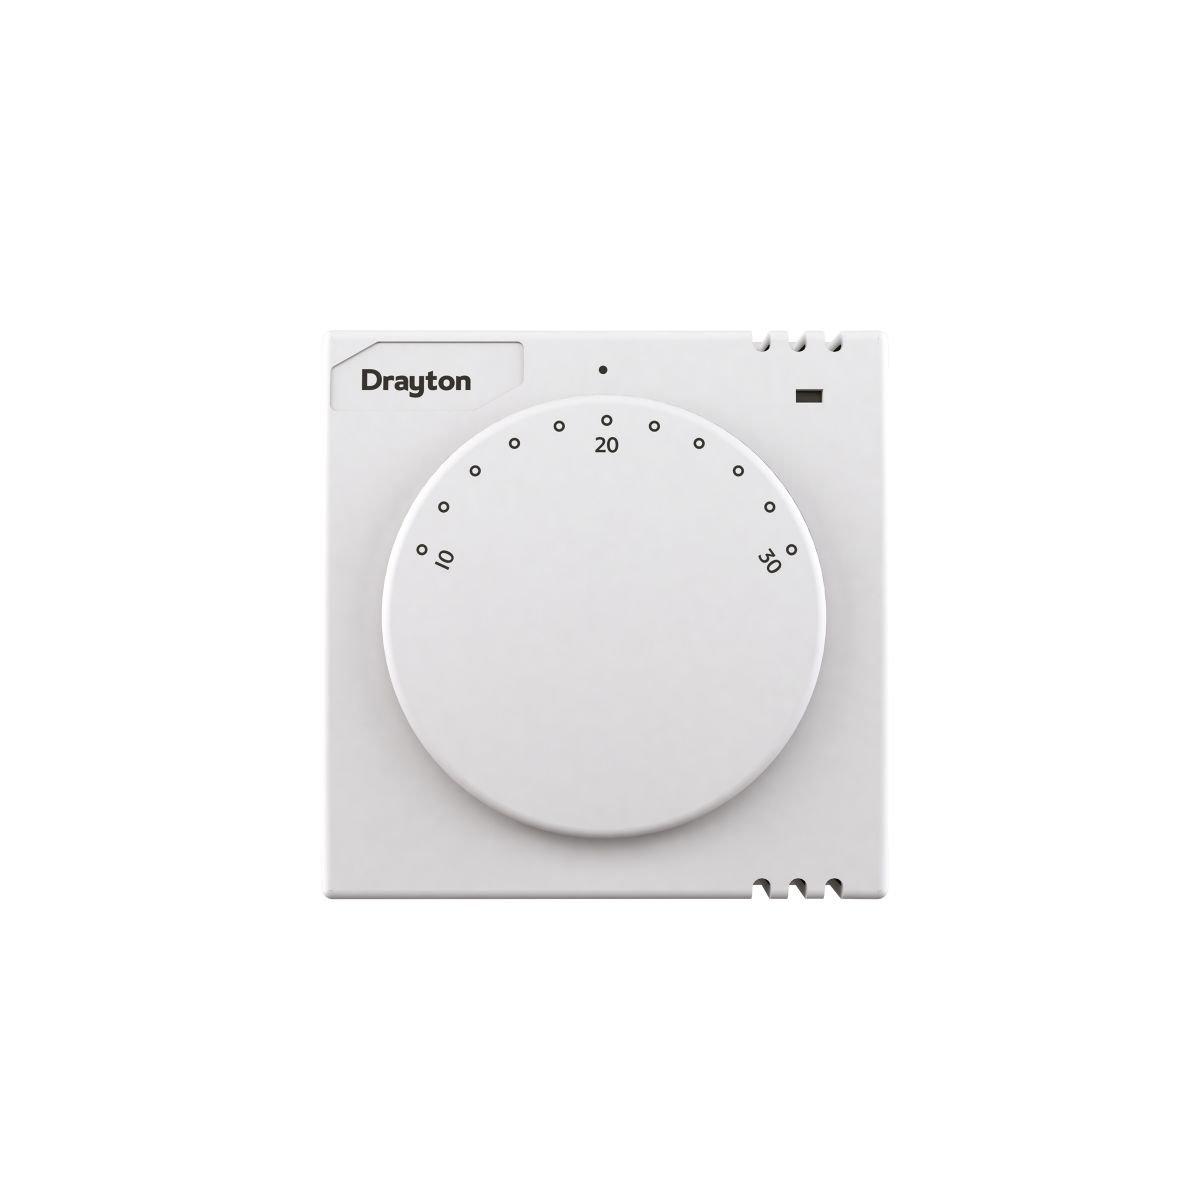 Drayton RTS2/24002SX Manual Room Thermostat